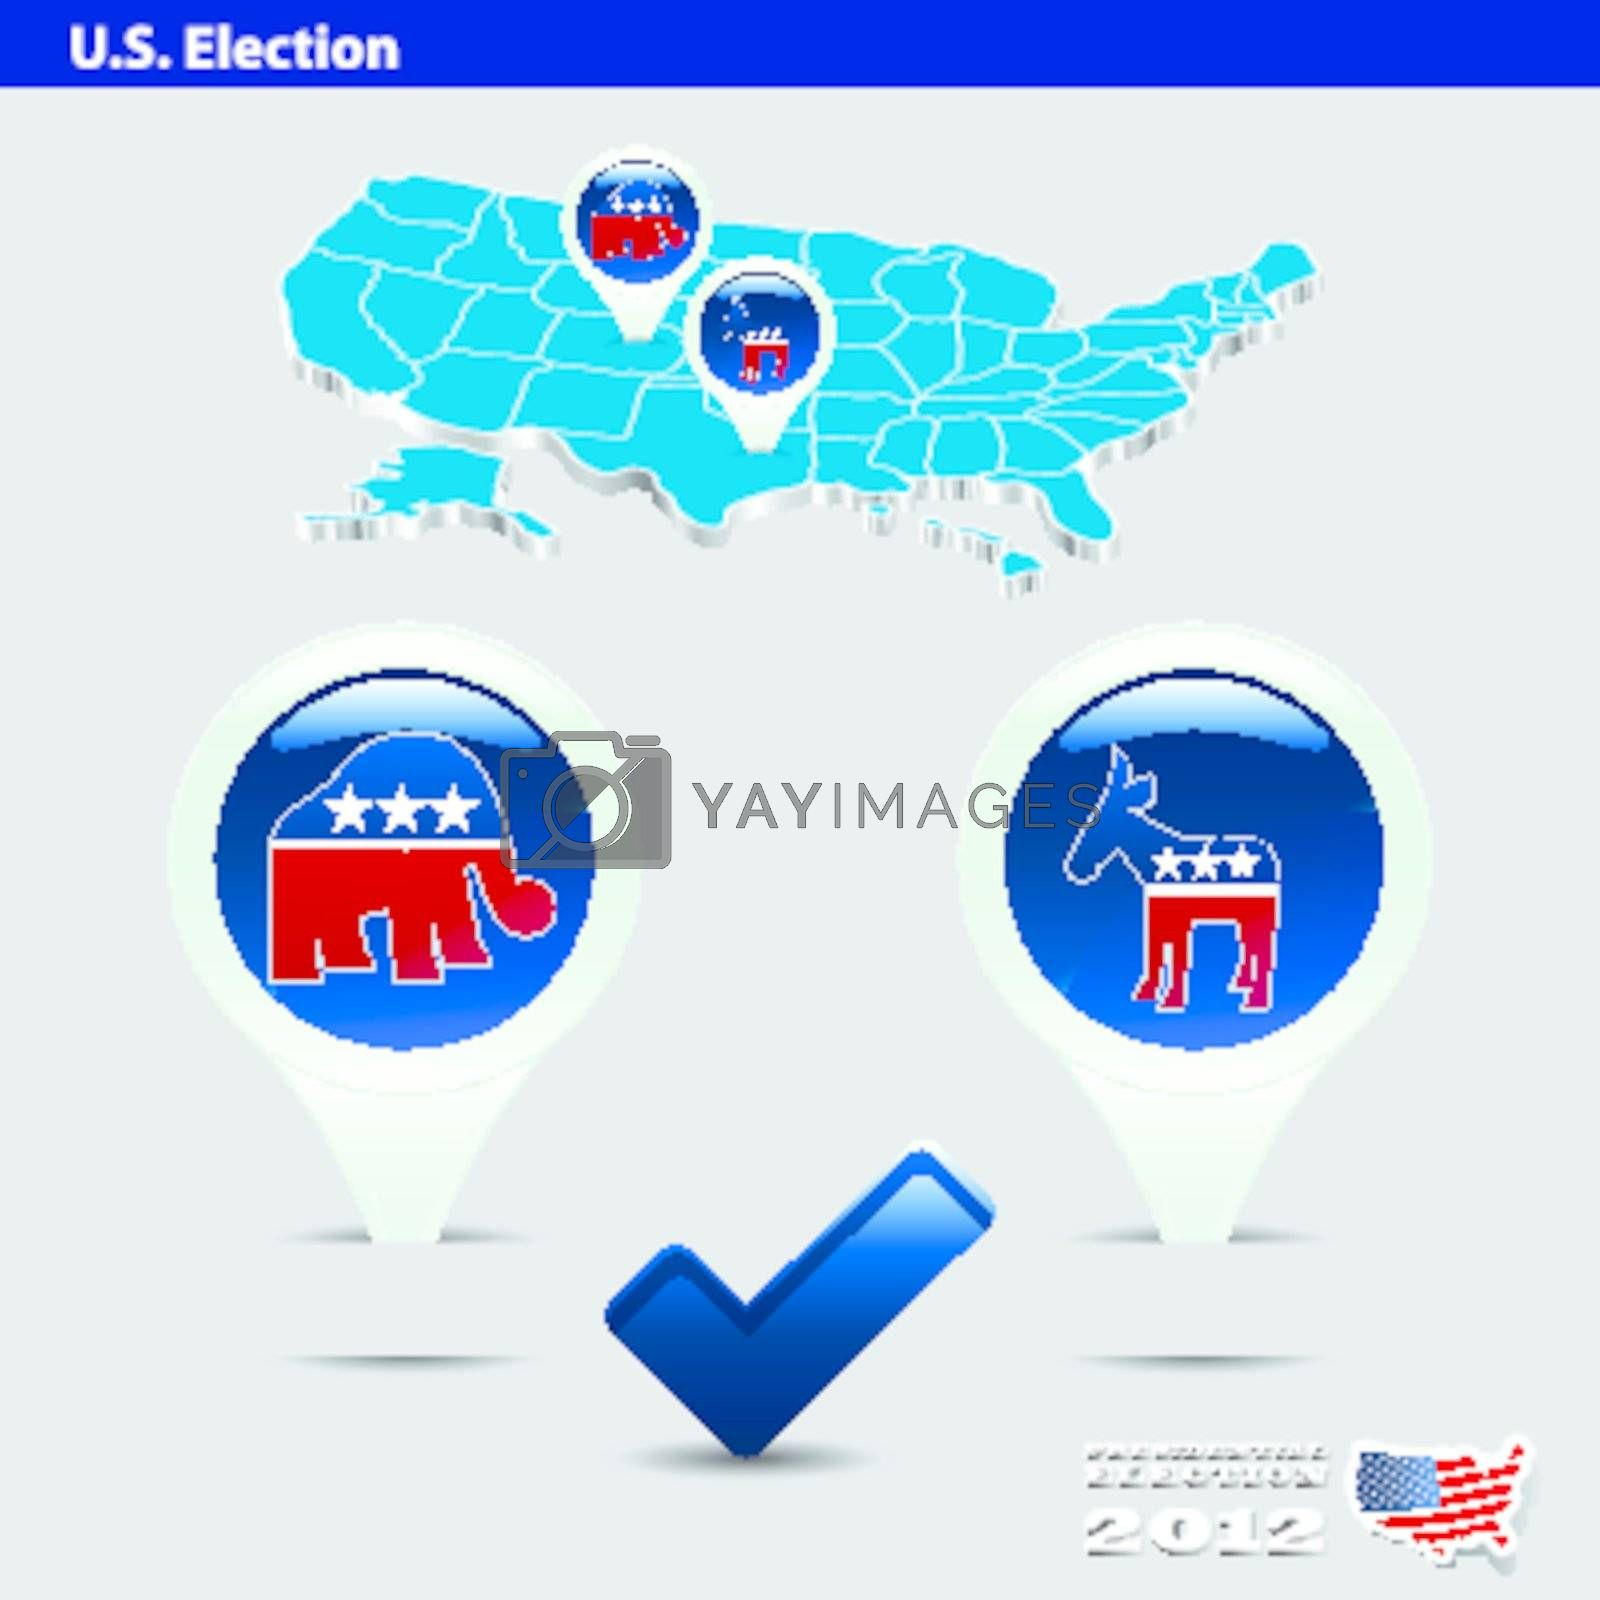 pin democrat or republican in US presidential 2012 election